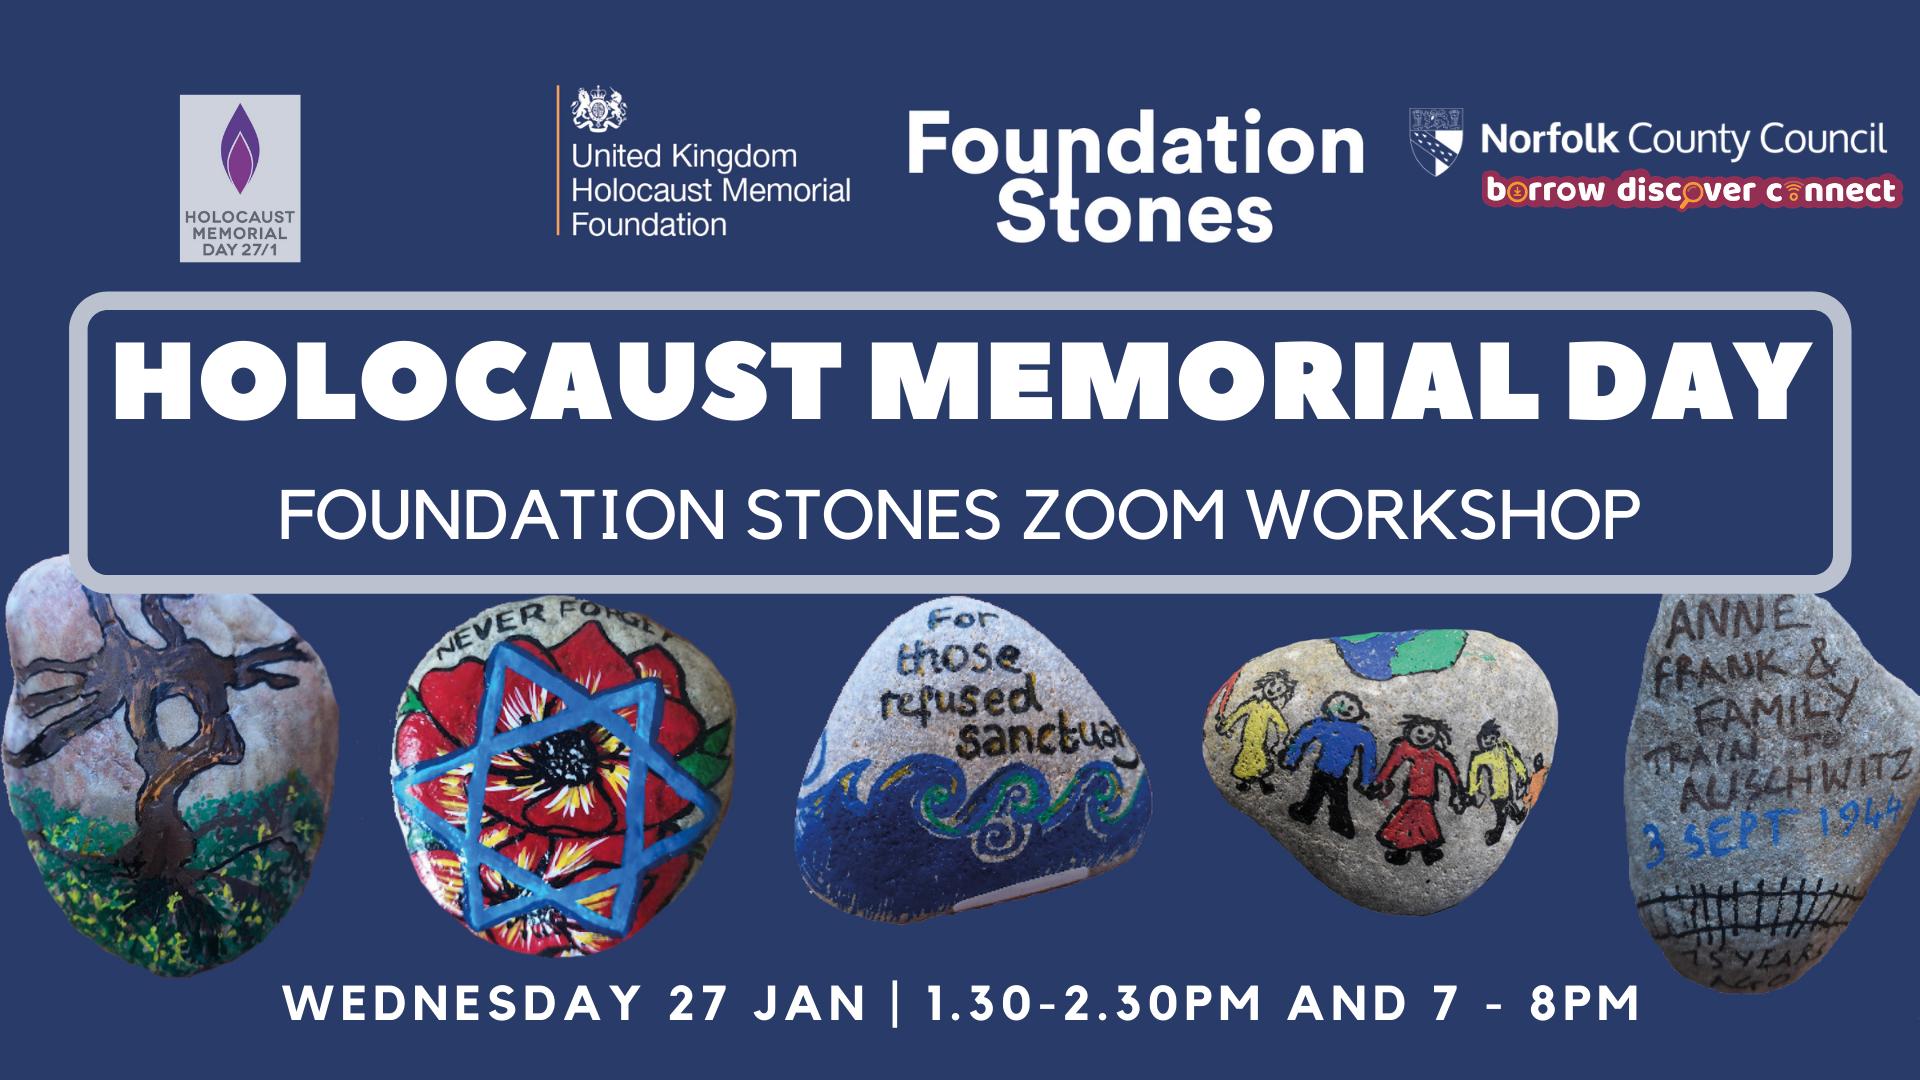 Foundation Stones Zoom Workshop